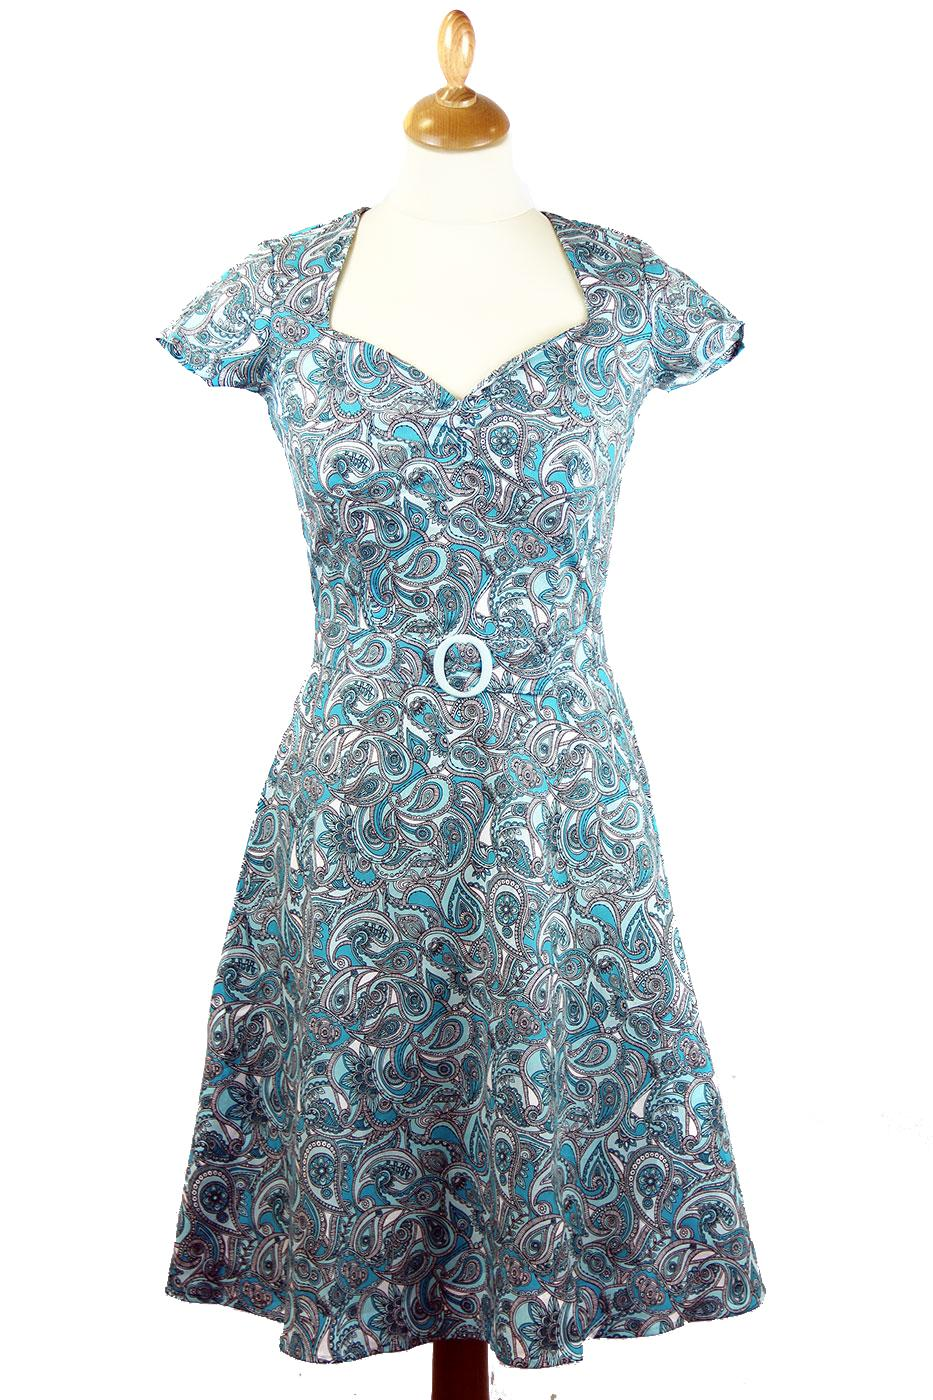 Aimee HEARTBREAKER Retro 60s Paisley Mod Dress